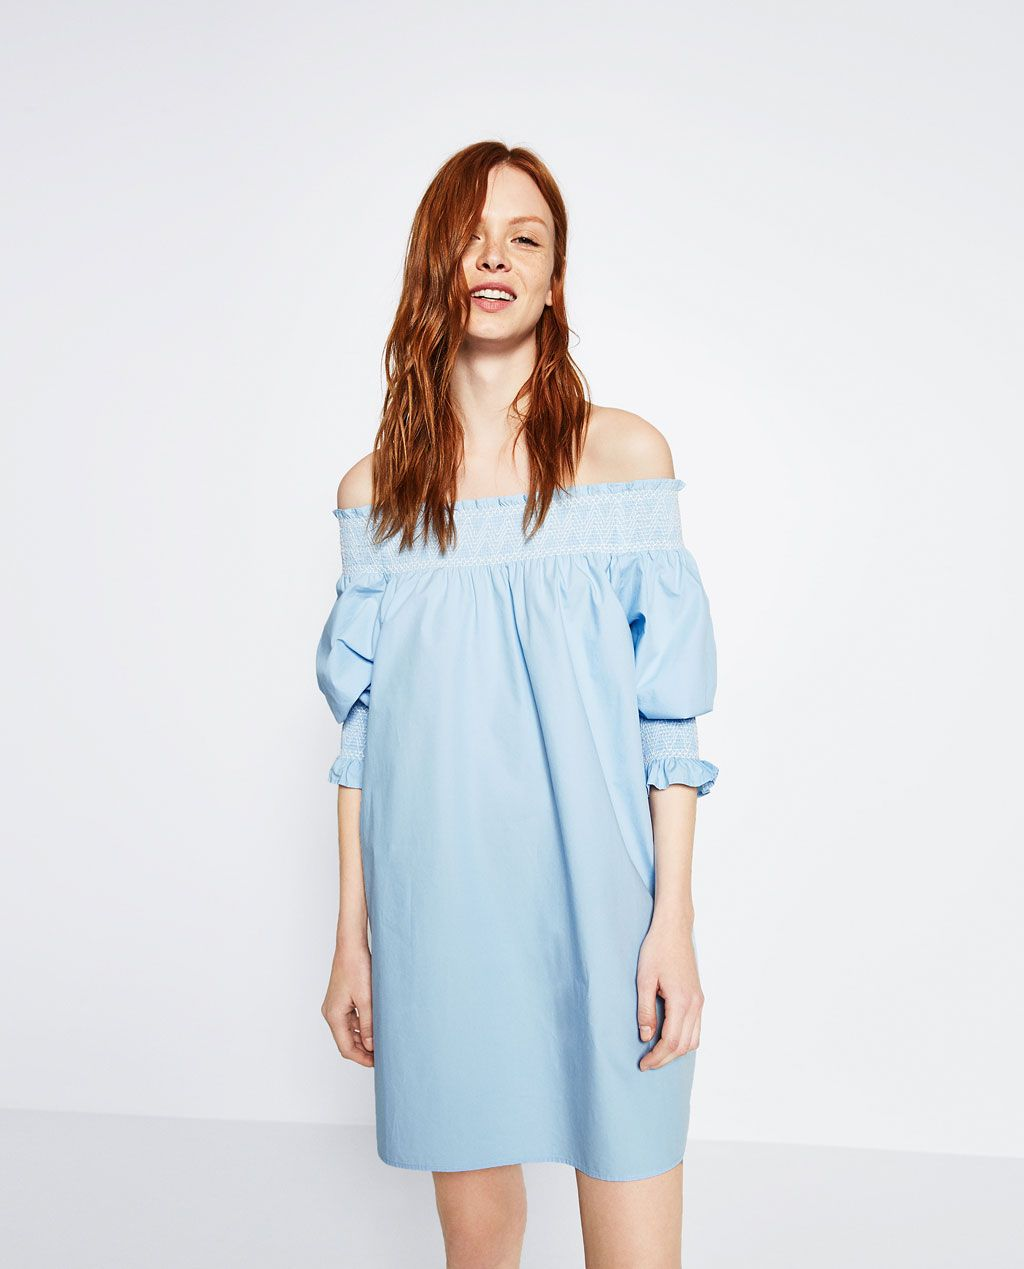 d06067819f7 ZARA - WOMAN - OFF-THE-SHOULDER POPLIN DRESS | V2 in 2019 | Túnicas ...